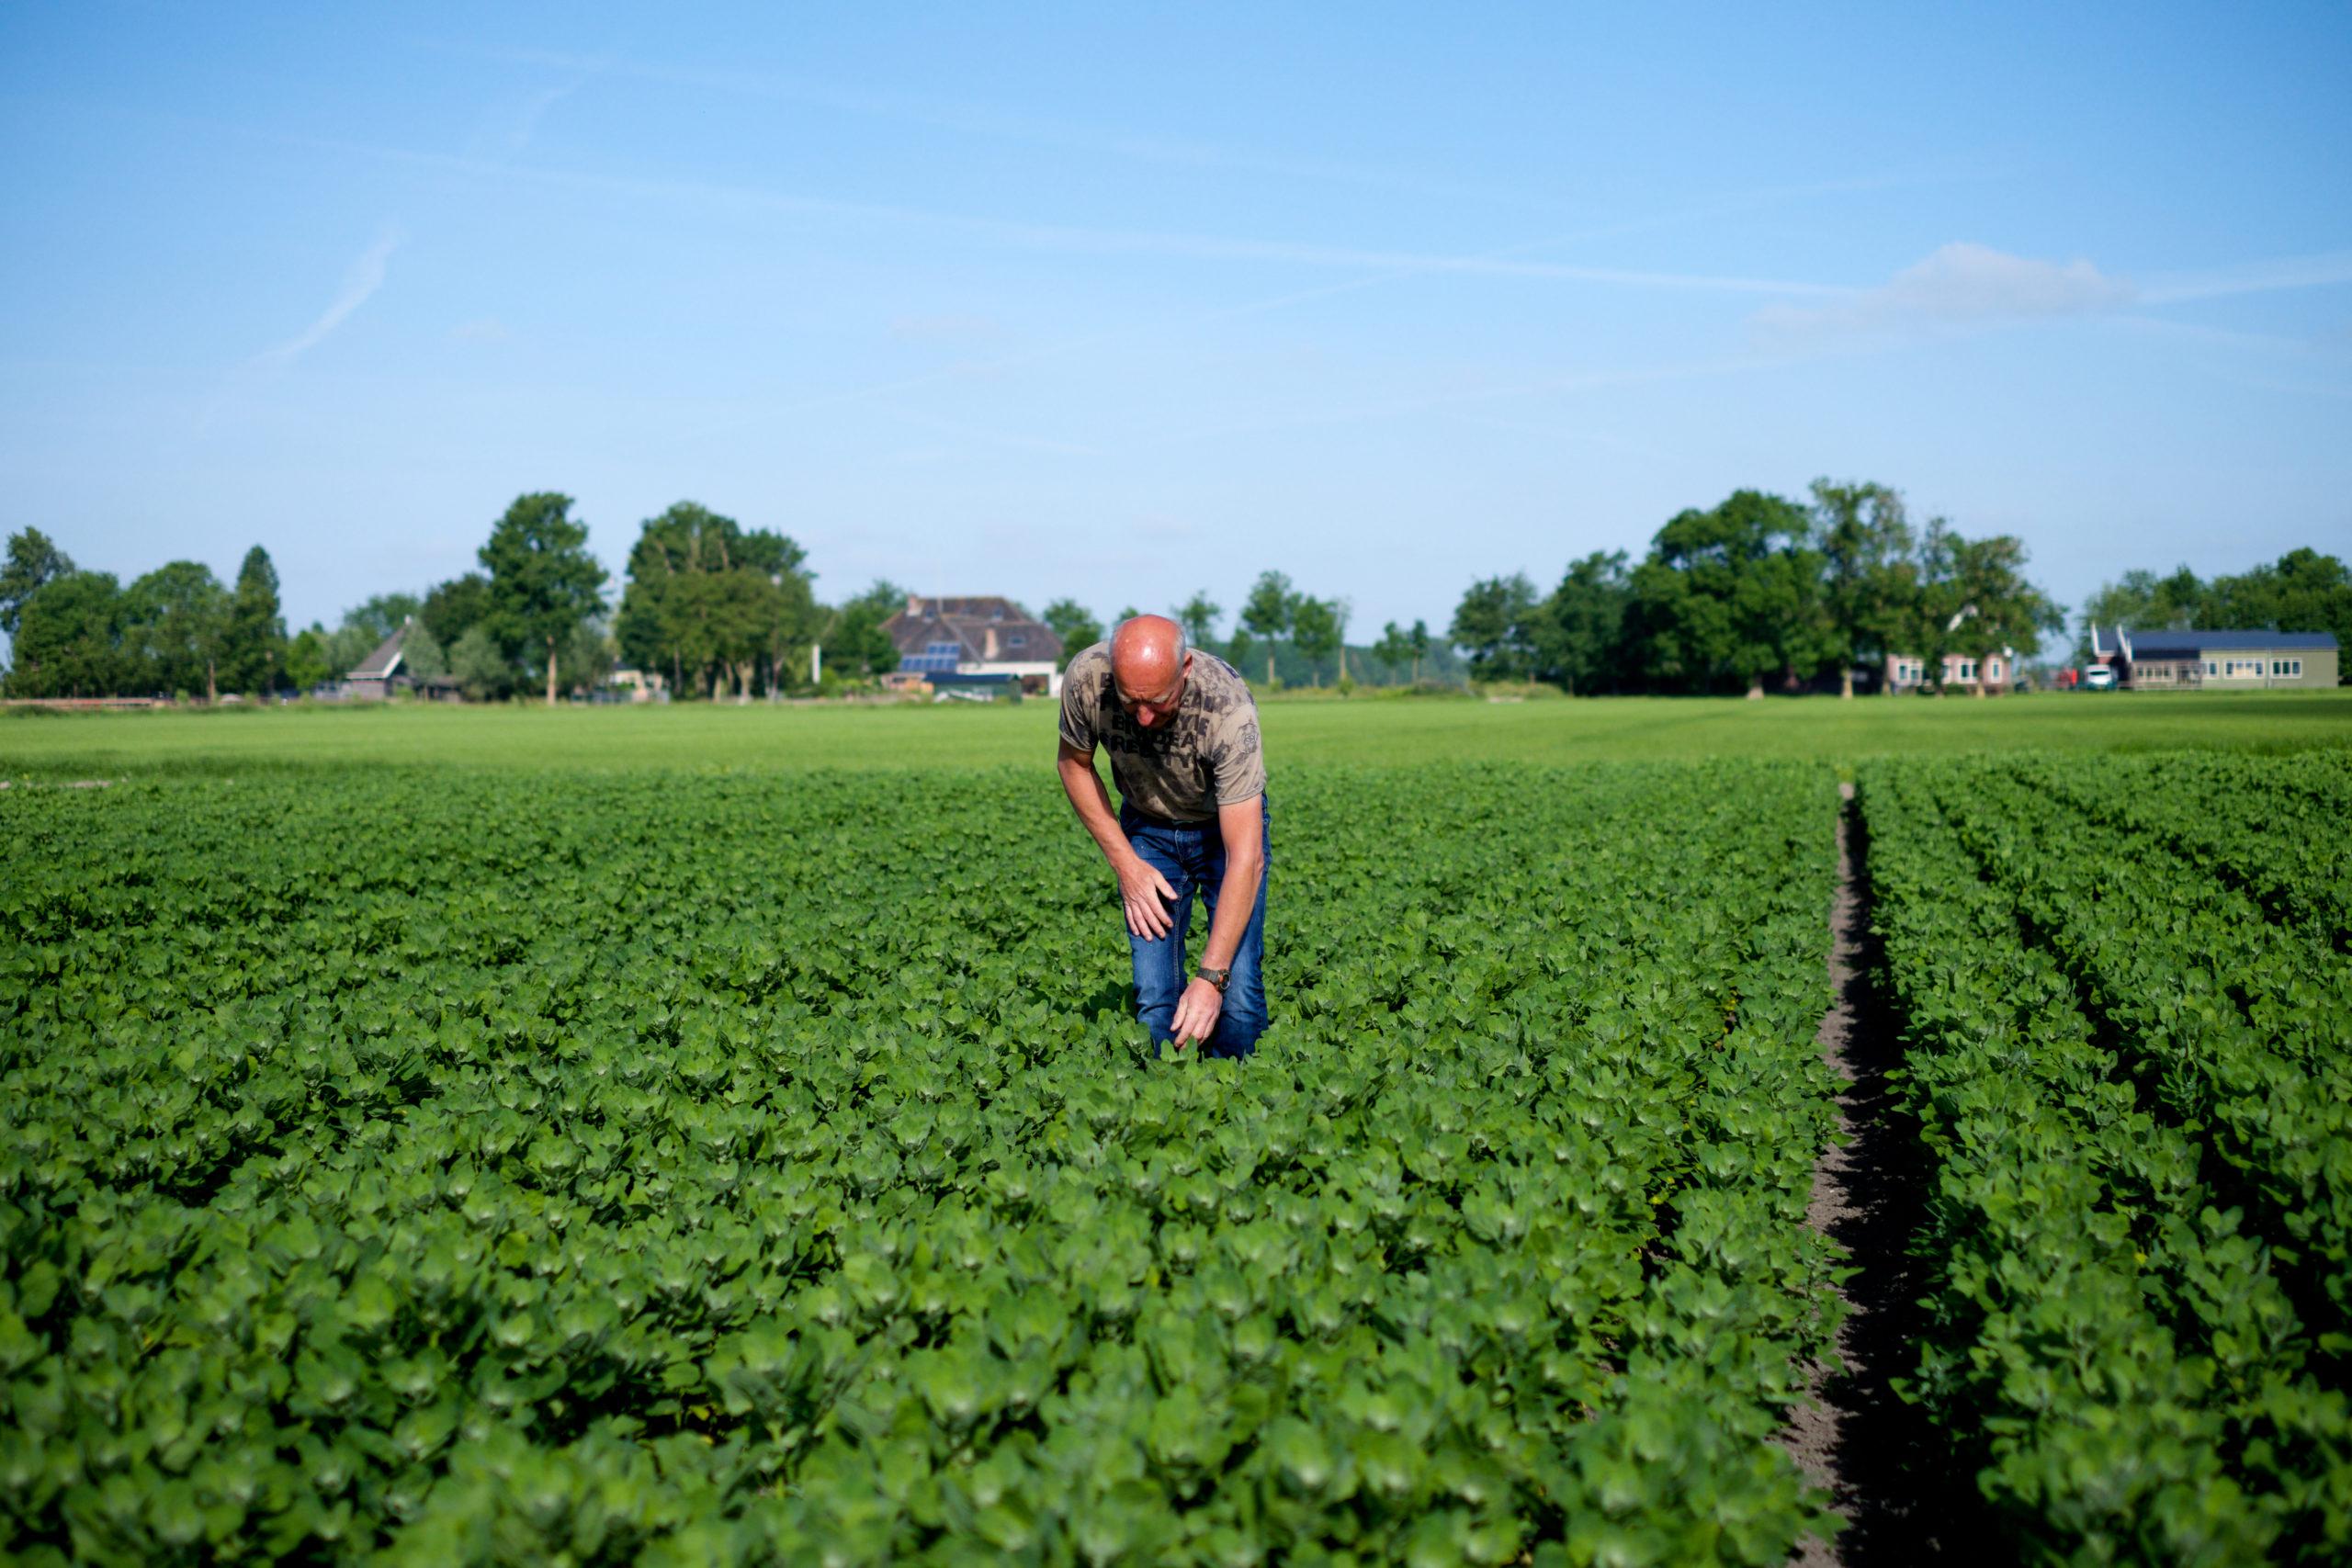 nederlandse quinoa velden oogsten